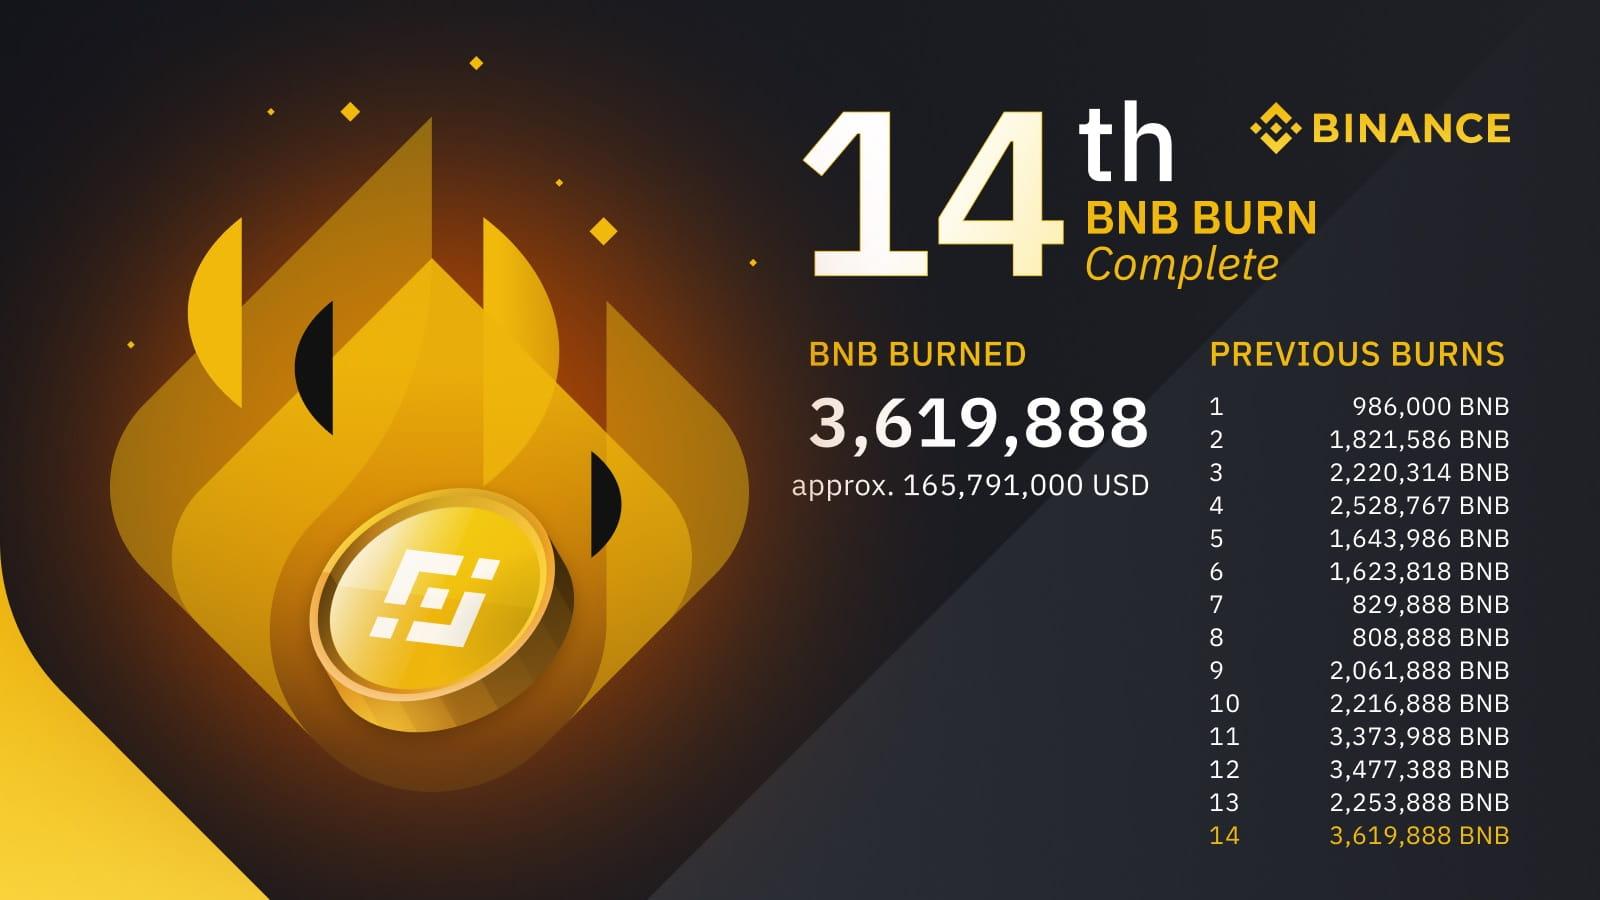 14th BNB Burn | Quarterly Highlights and Insights from CZ | Binance Blog